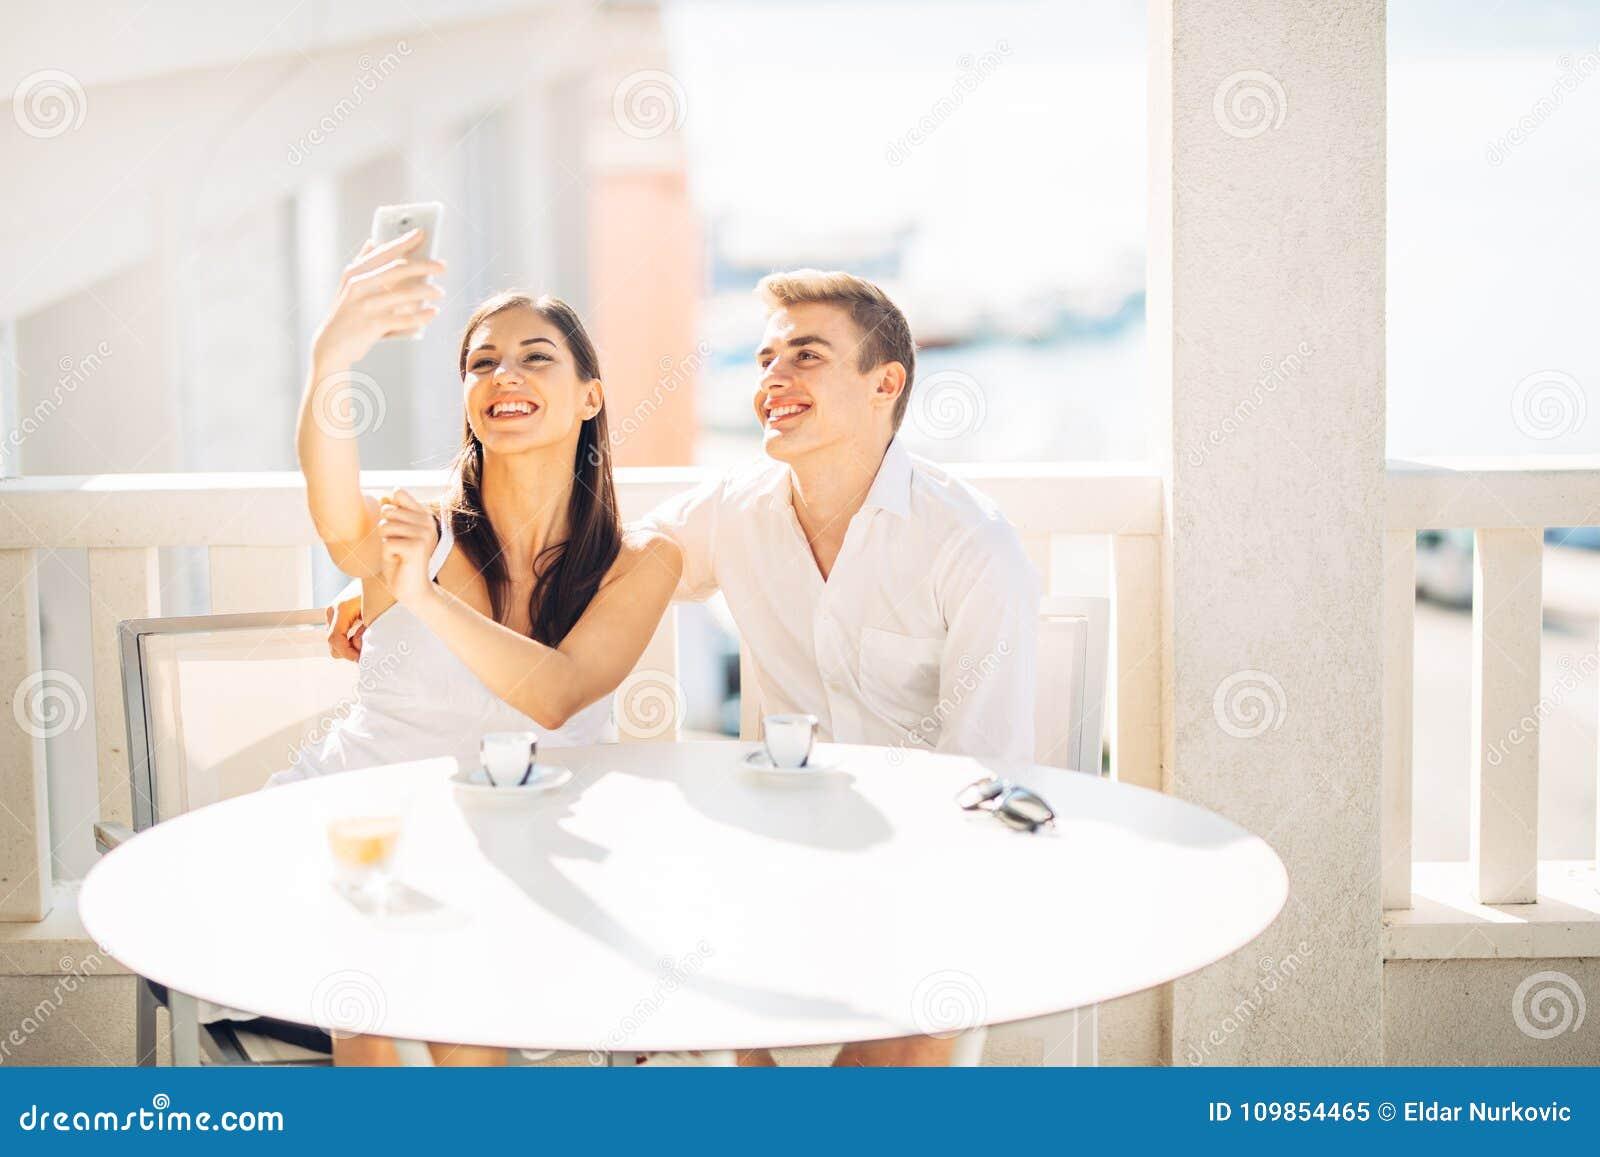 Public nude russian girls